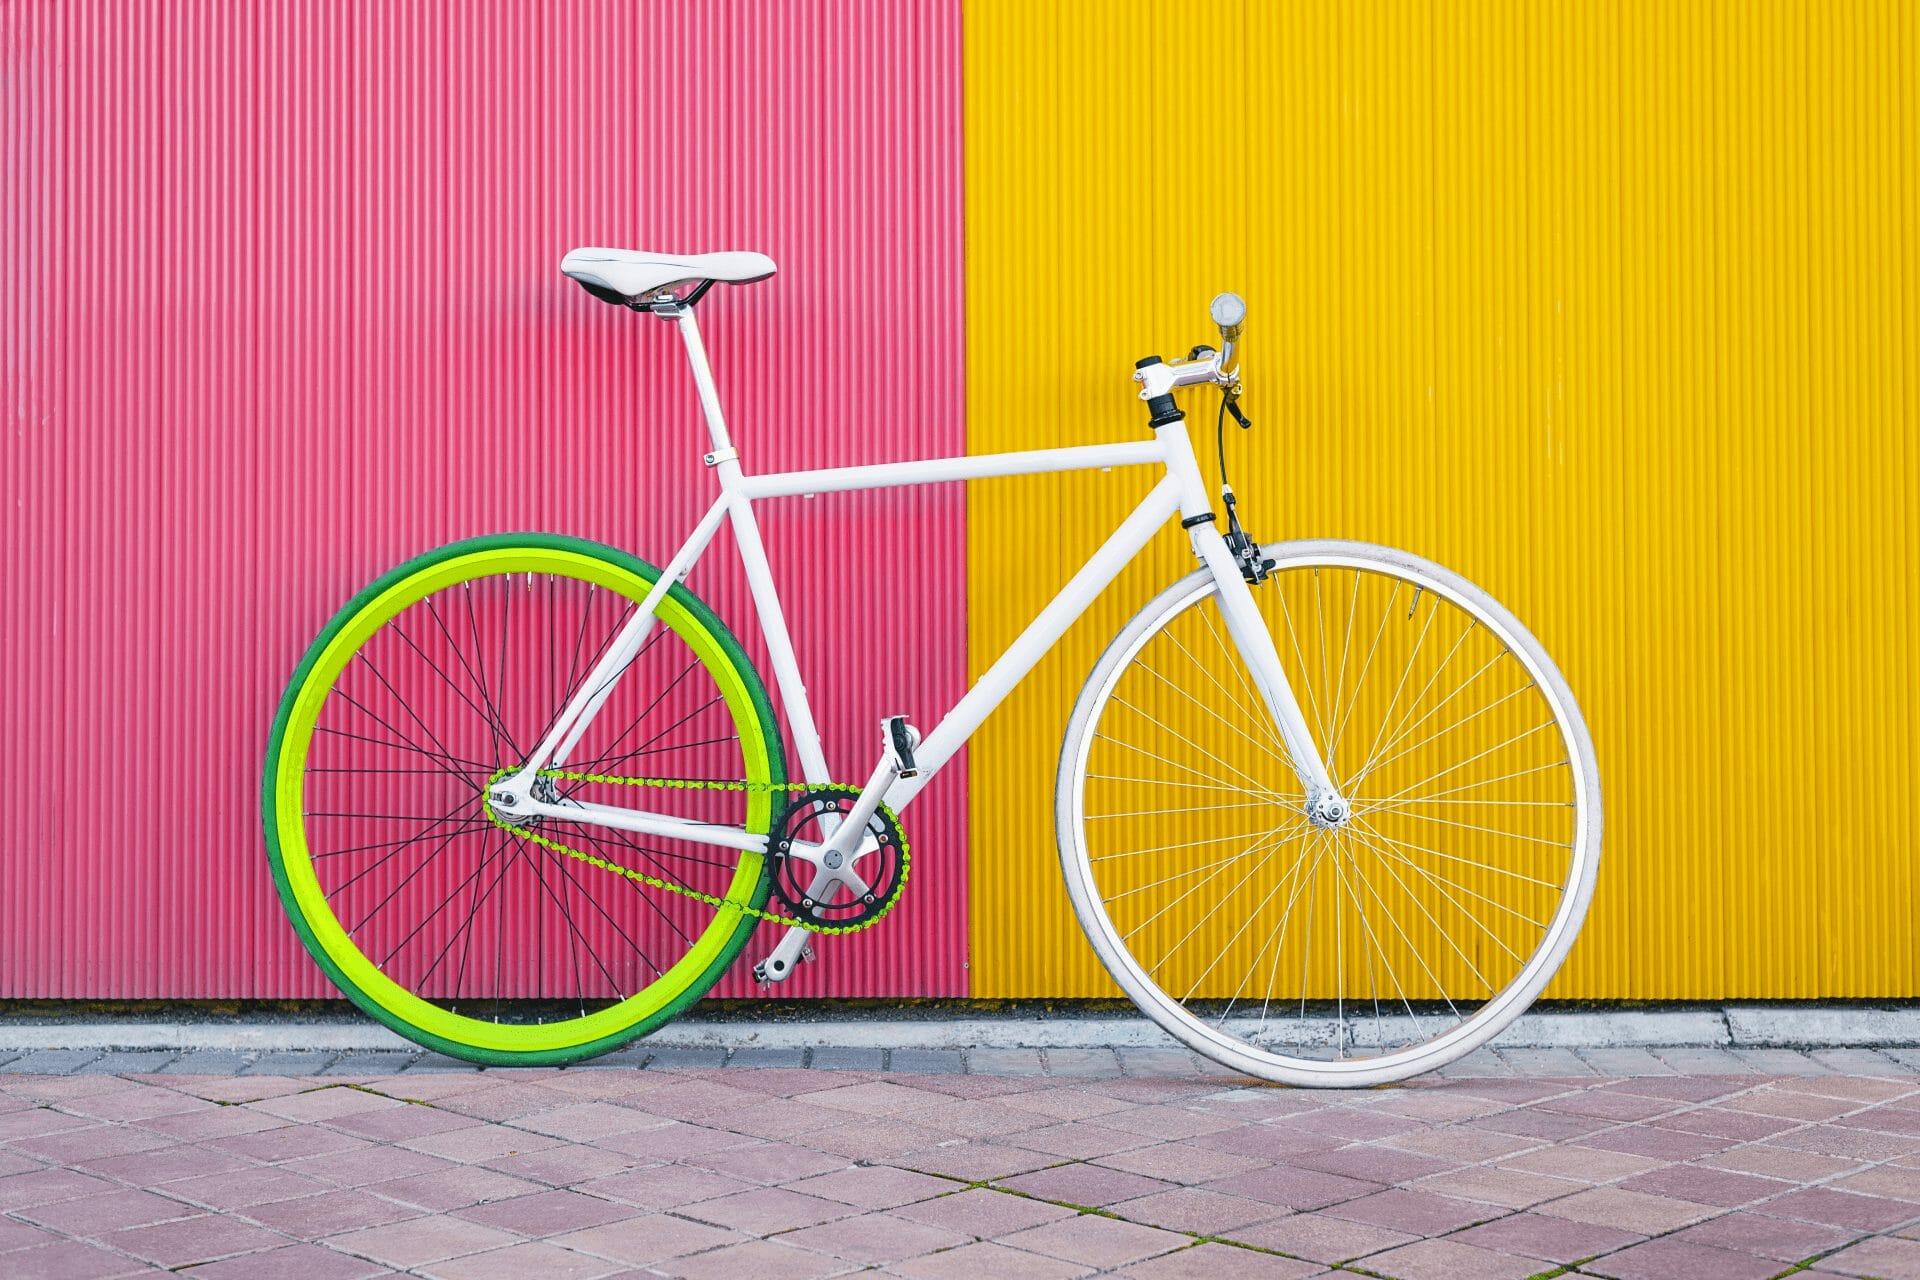 smar do lancucha rowerowego